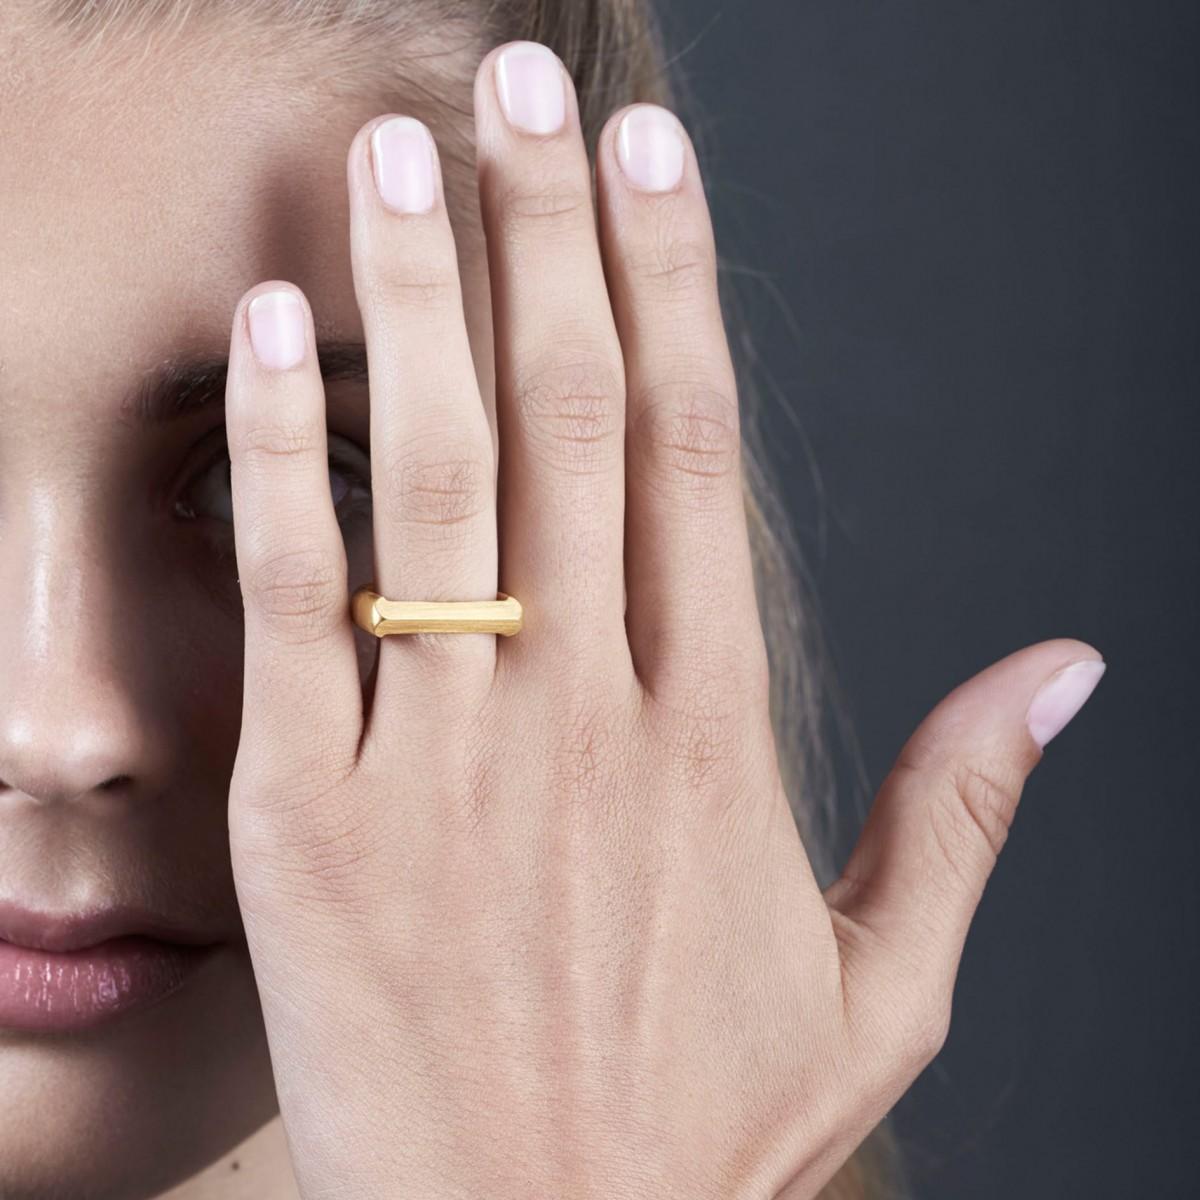 Jasmina Jovy Jewellery Hidden Faces Ring RIHF04 gold plated